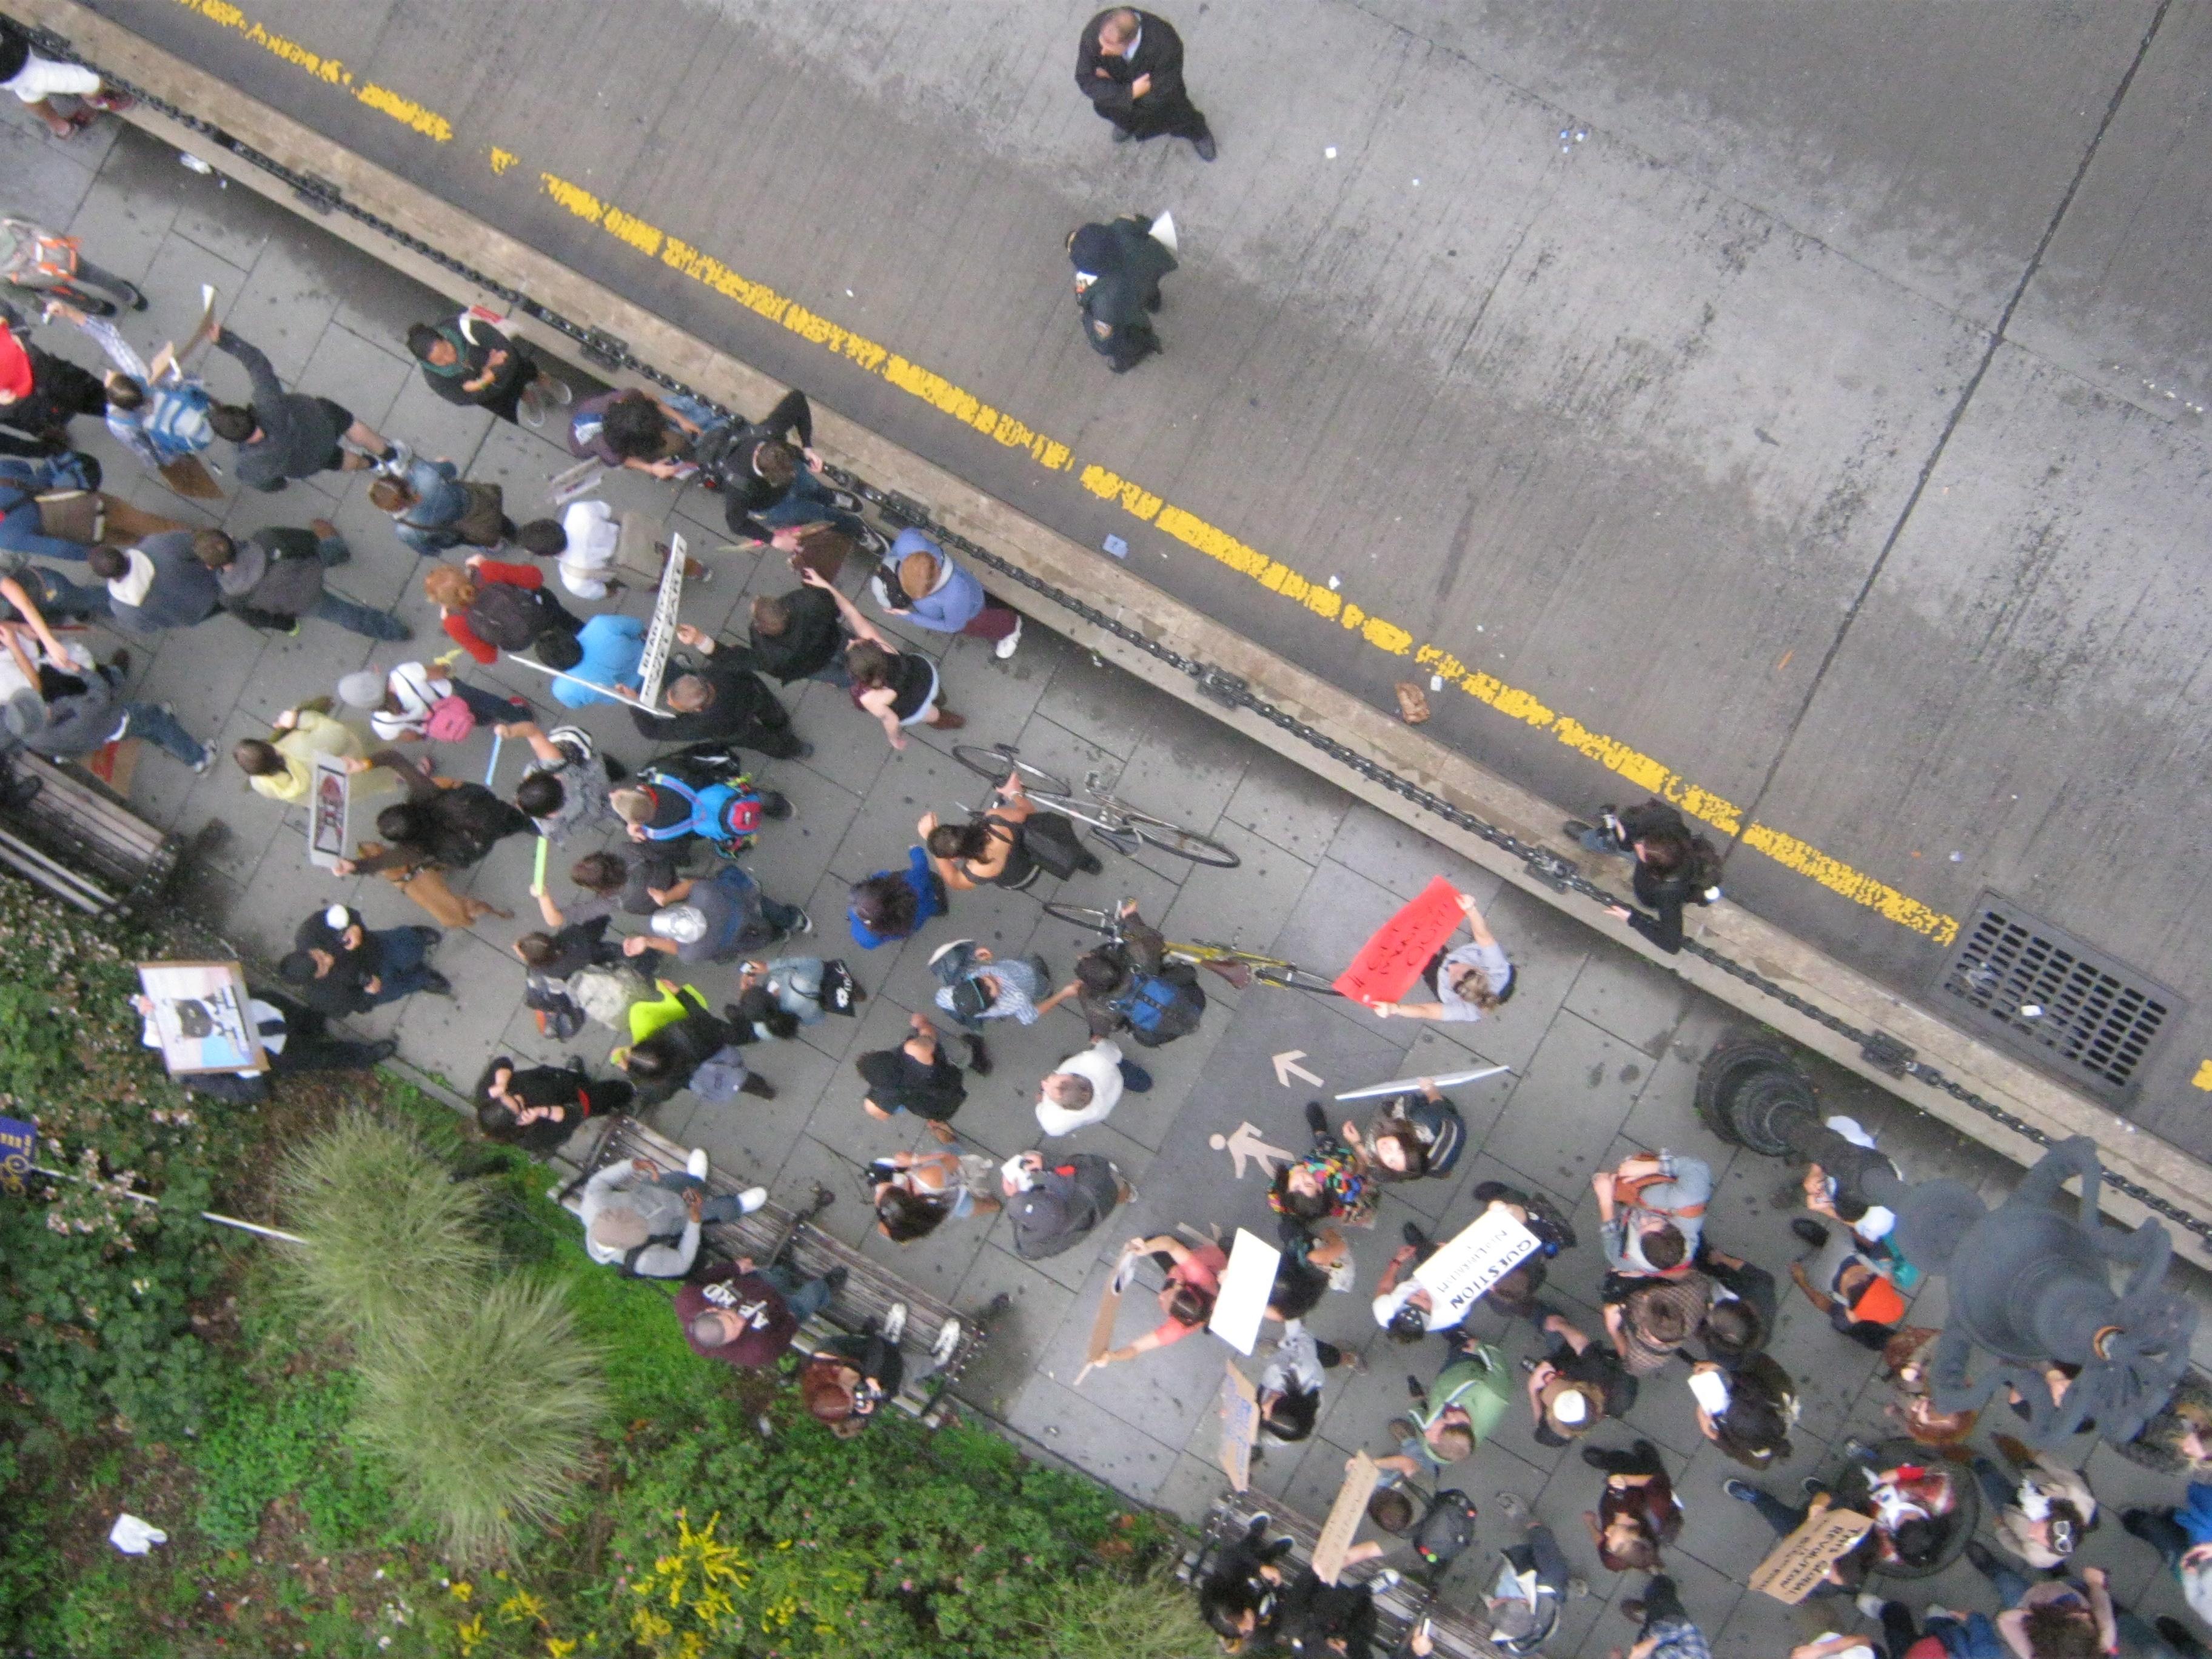 2011-10-01-newyork-occupywallstreet